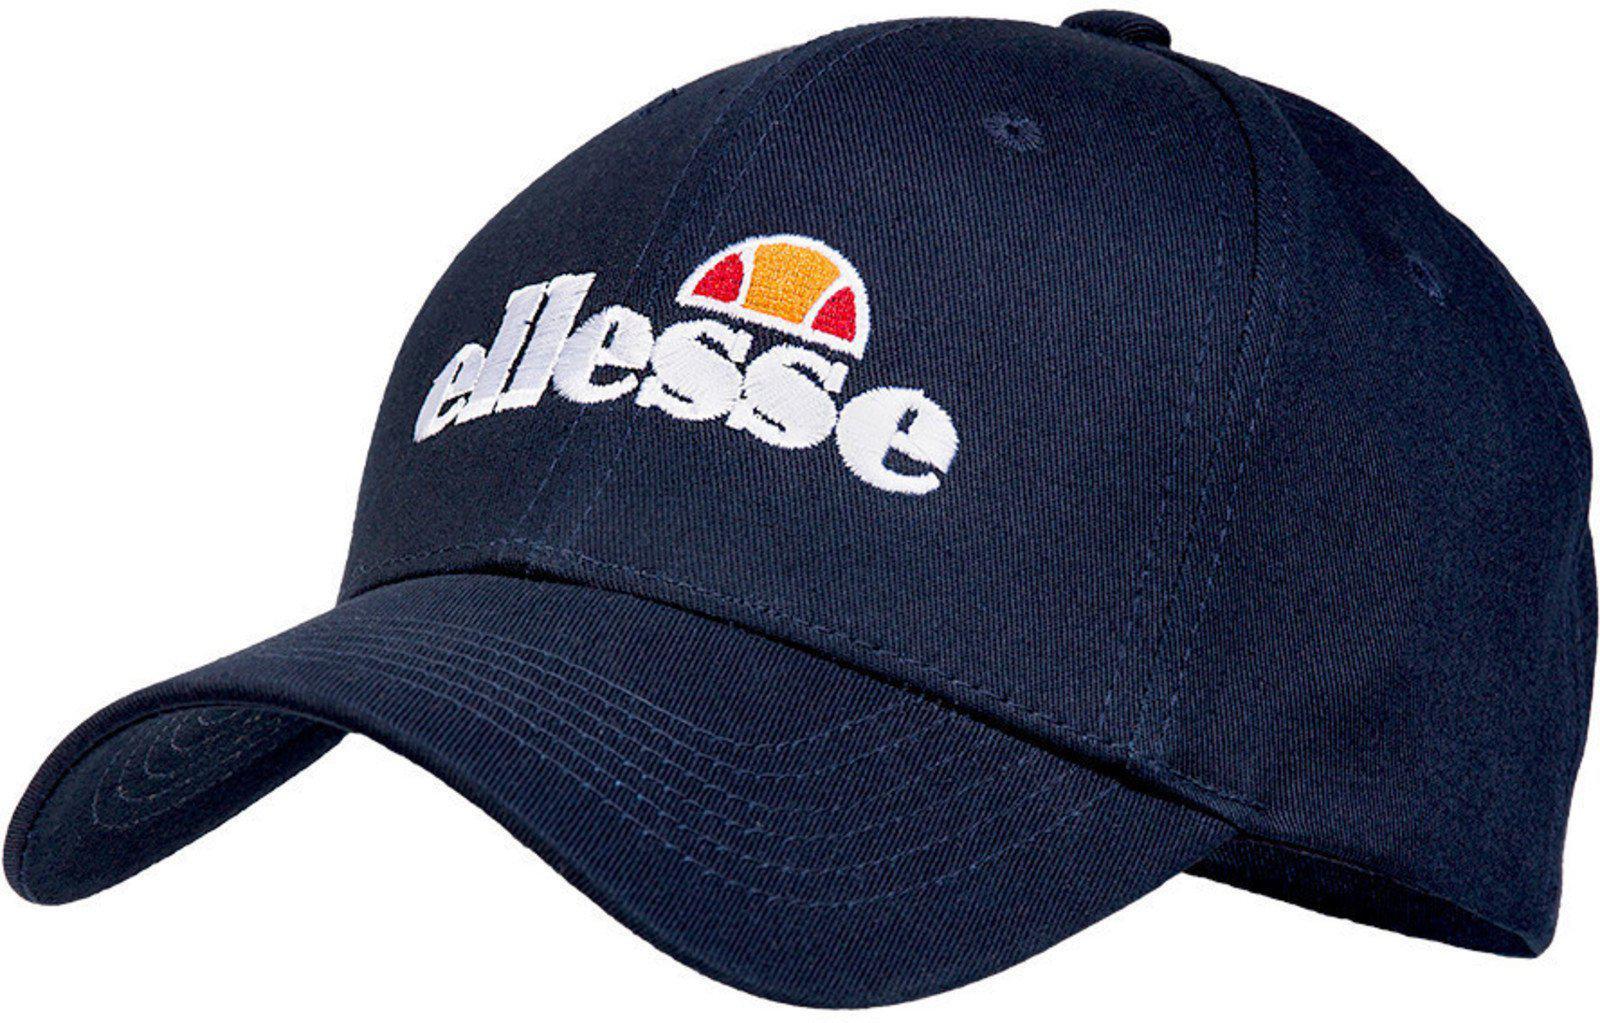 6b945ef5 Ellesse Efiso Snapback Baseball Cap in Blue - Lyst